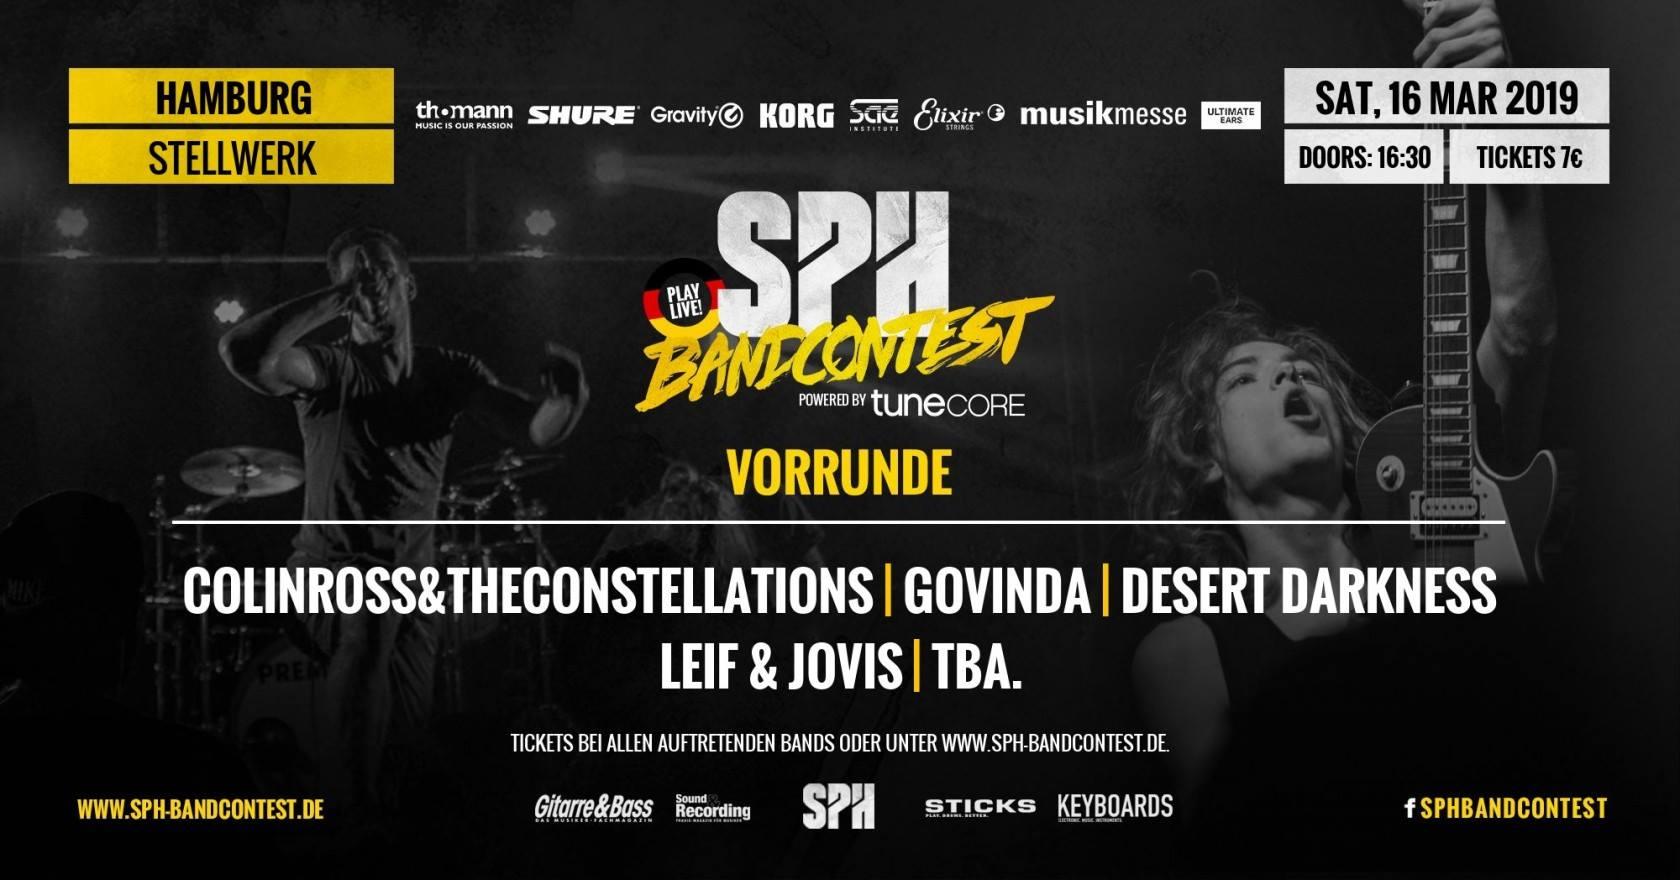 SPH Bandcontest Vorrunde // Hamburg